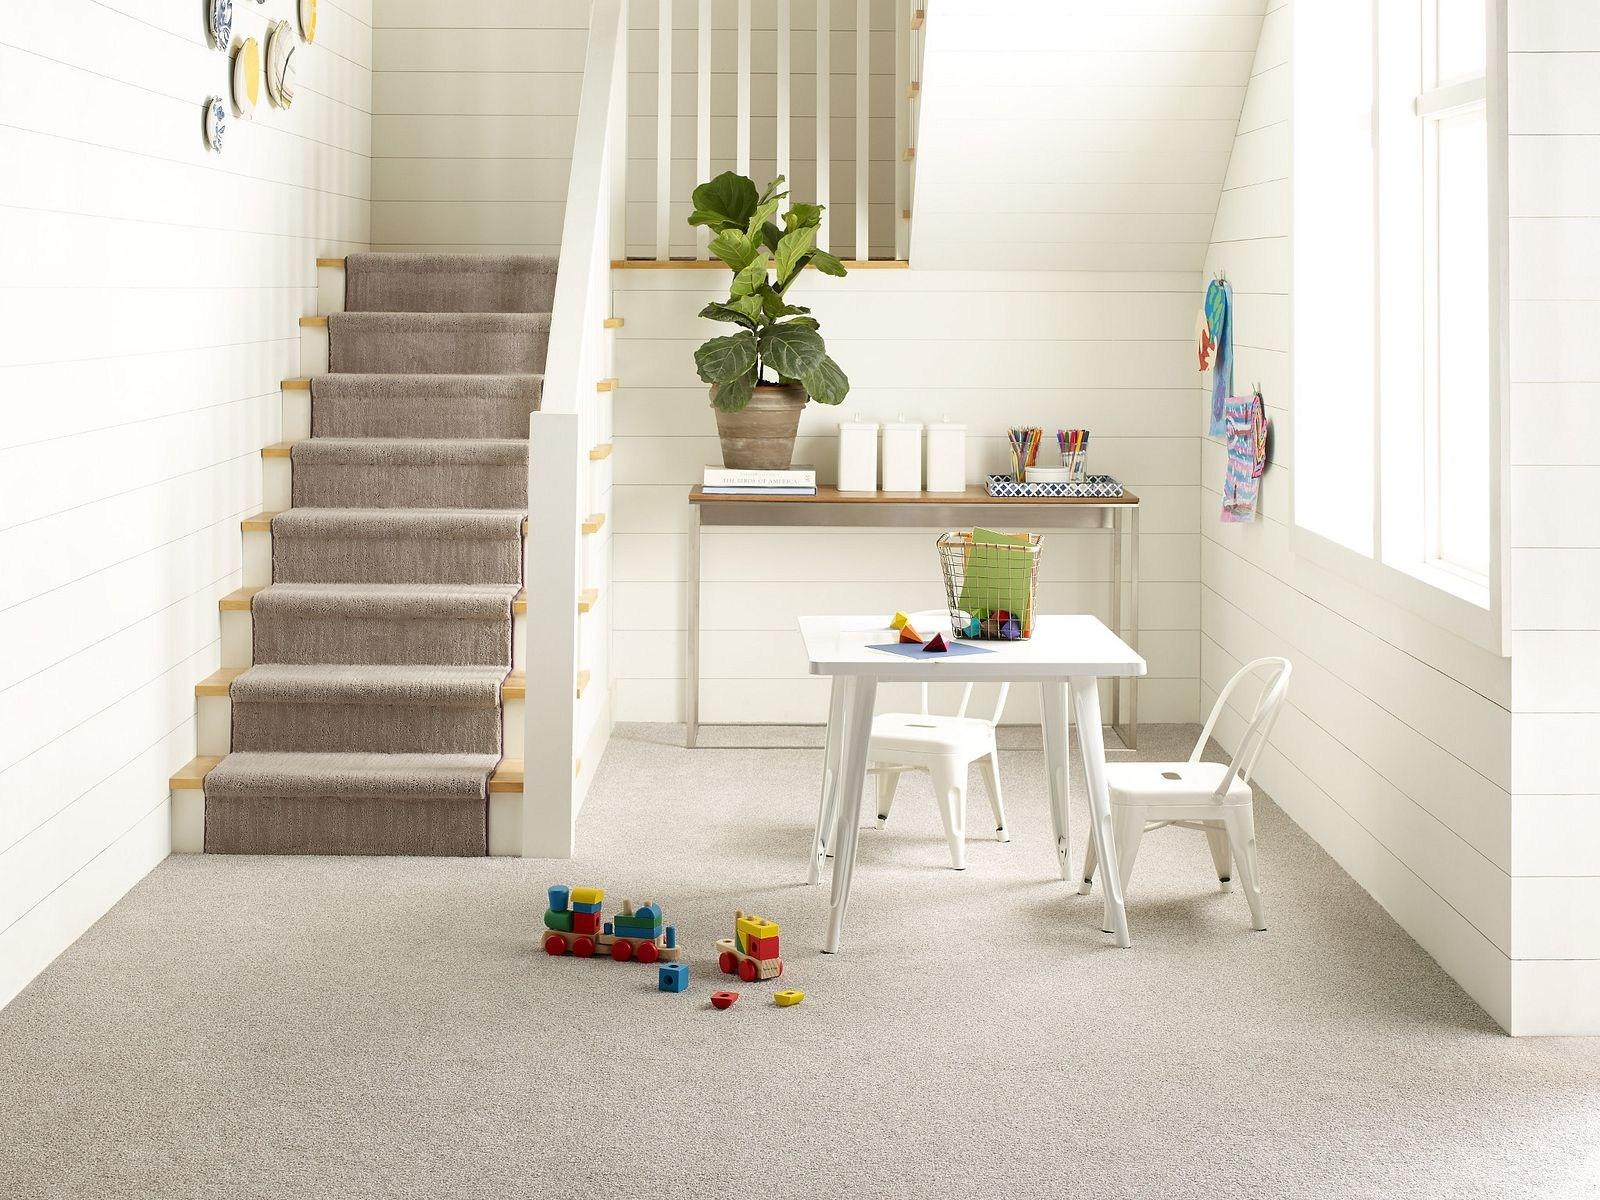 Carpet Carpeting Berber Texture More Shaw Floors | Carpet Squares For Steps | Kajaria Staircase | Stair Runner | Dean Wrap Around Treads | Communal Stairway | Flower Design